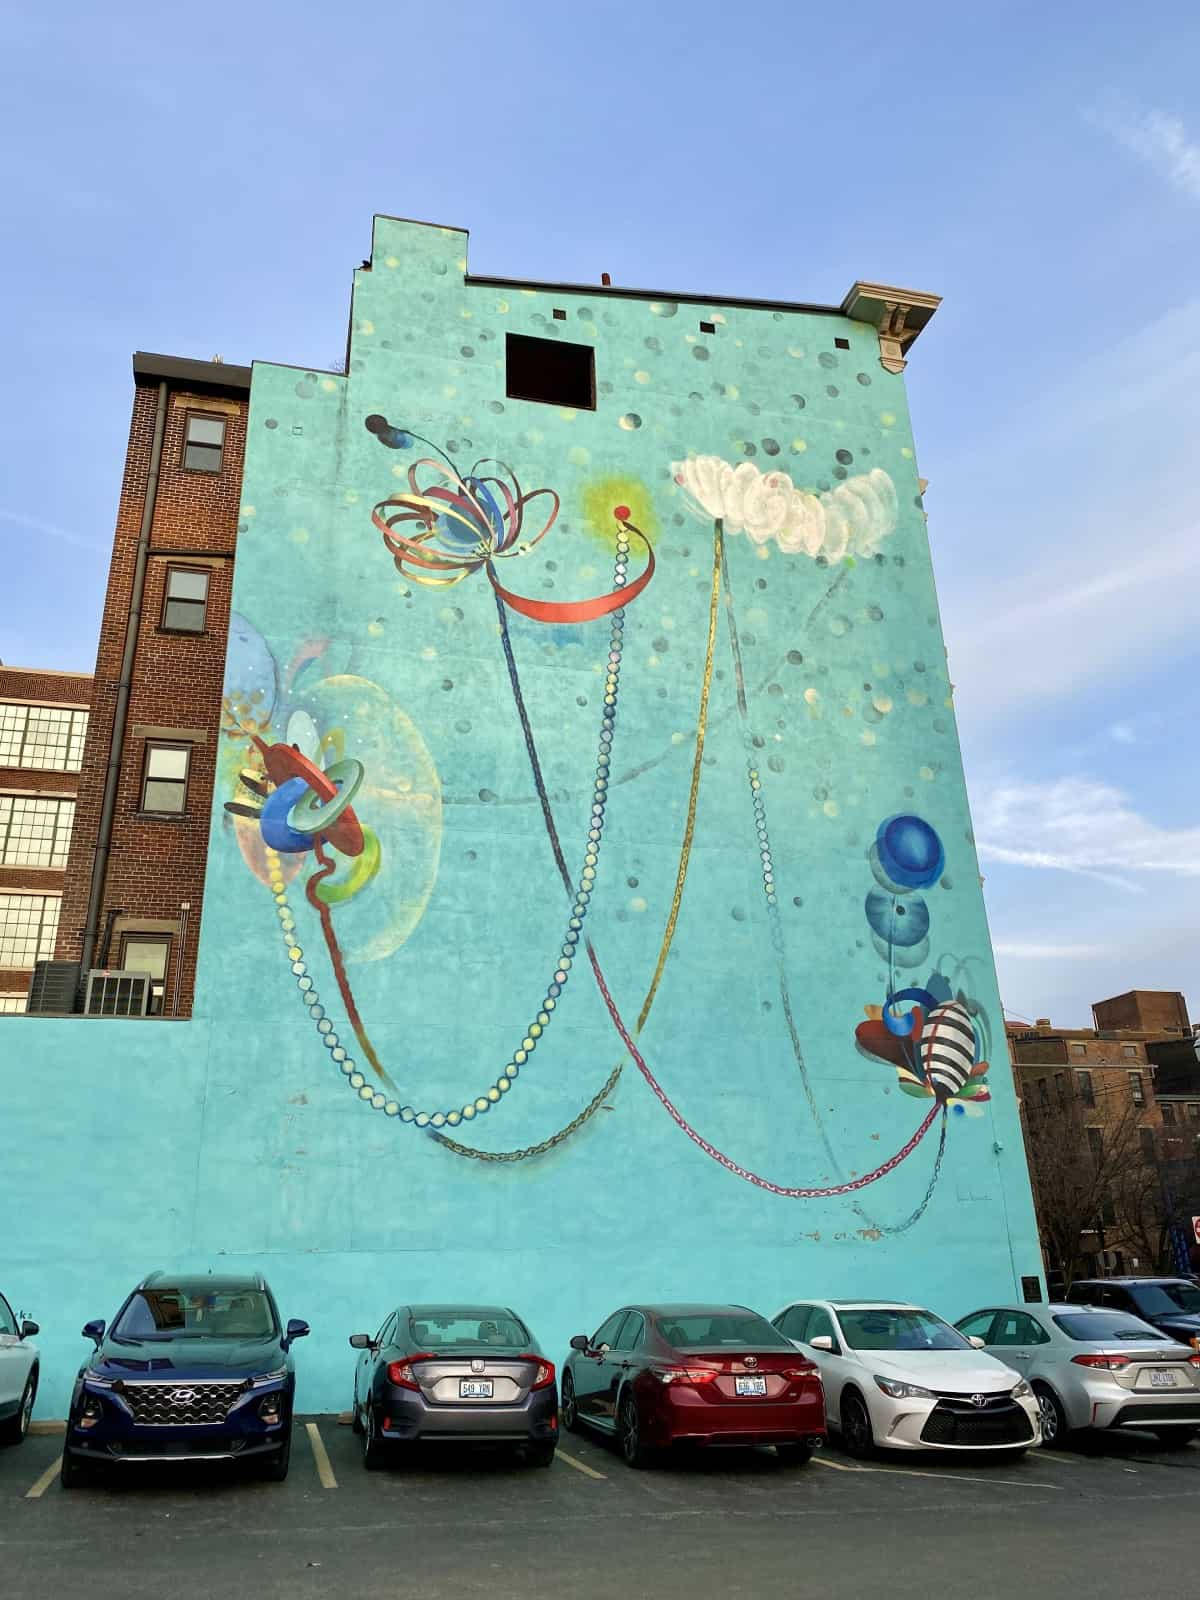 What to see exploring Cincinnati's street art - some of the best murals in Cincinnati